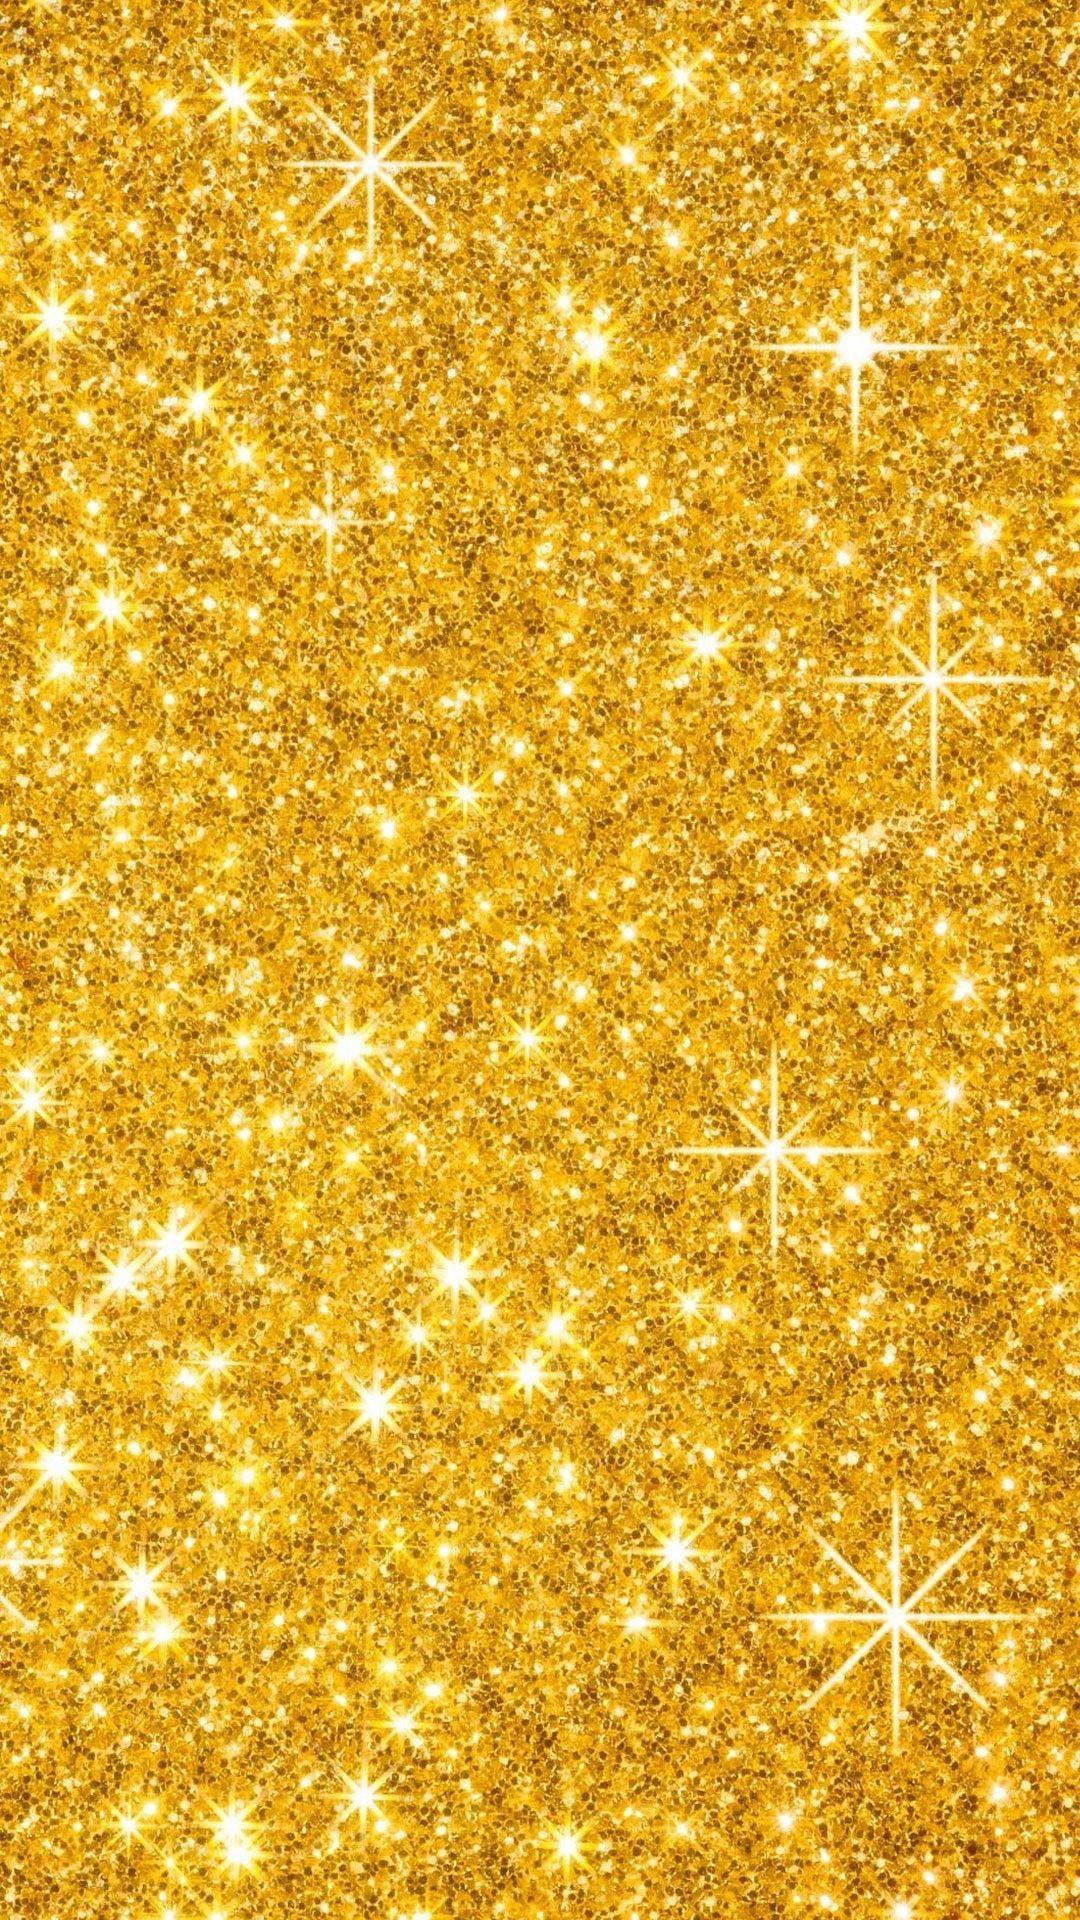 1080x1920, Gold Sparkle Iphone Wallpaper - Belle Wallpaper Disney Princess - HD Wallpaper